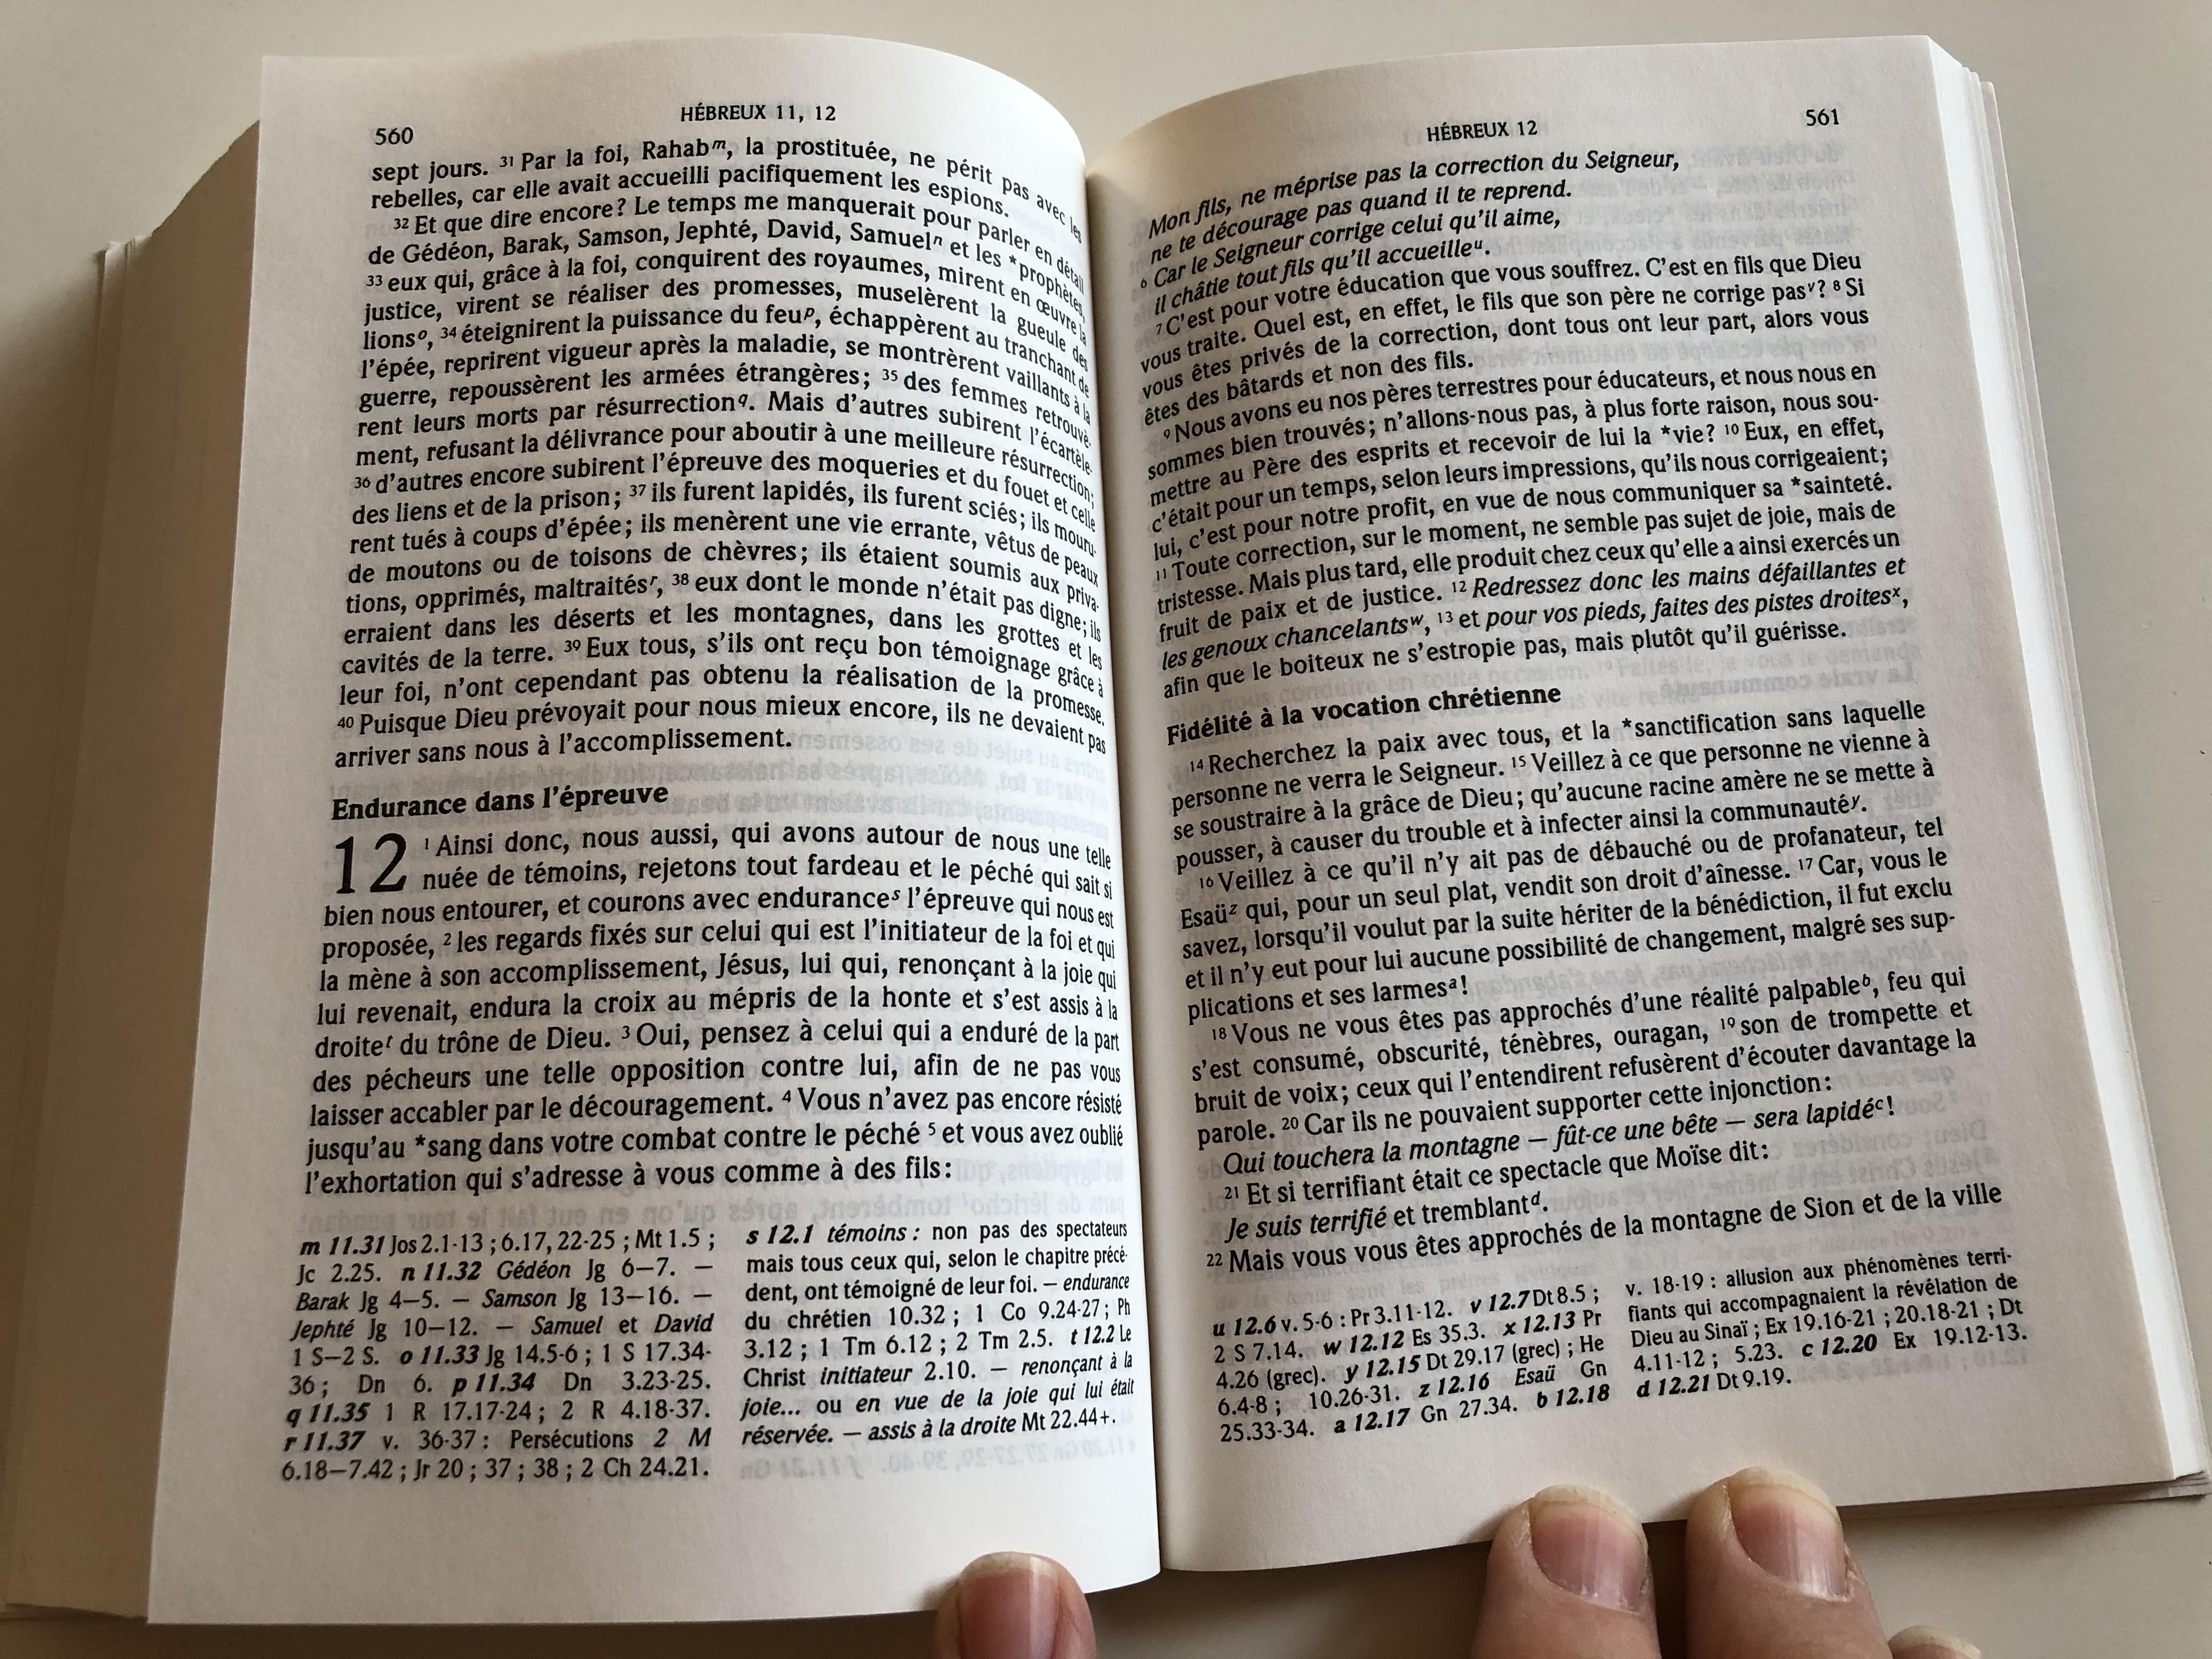 -nouveau-testament-french-language-tob-new-testament-paperback-10.jpg